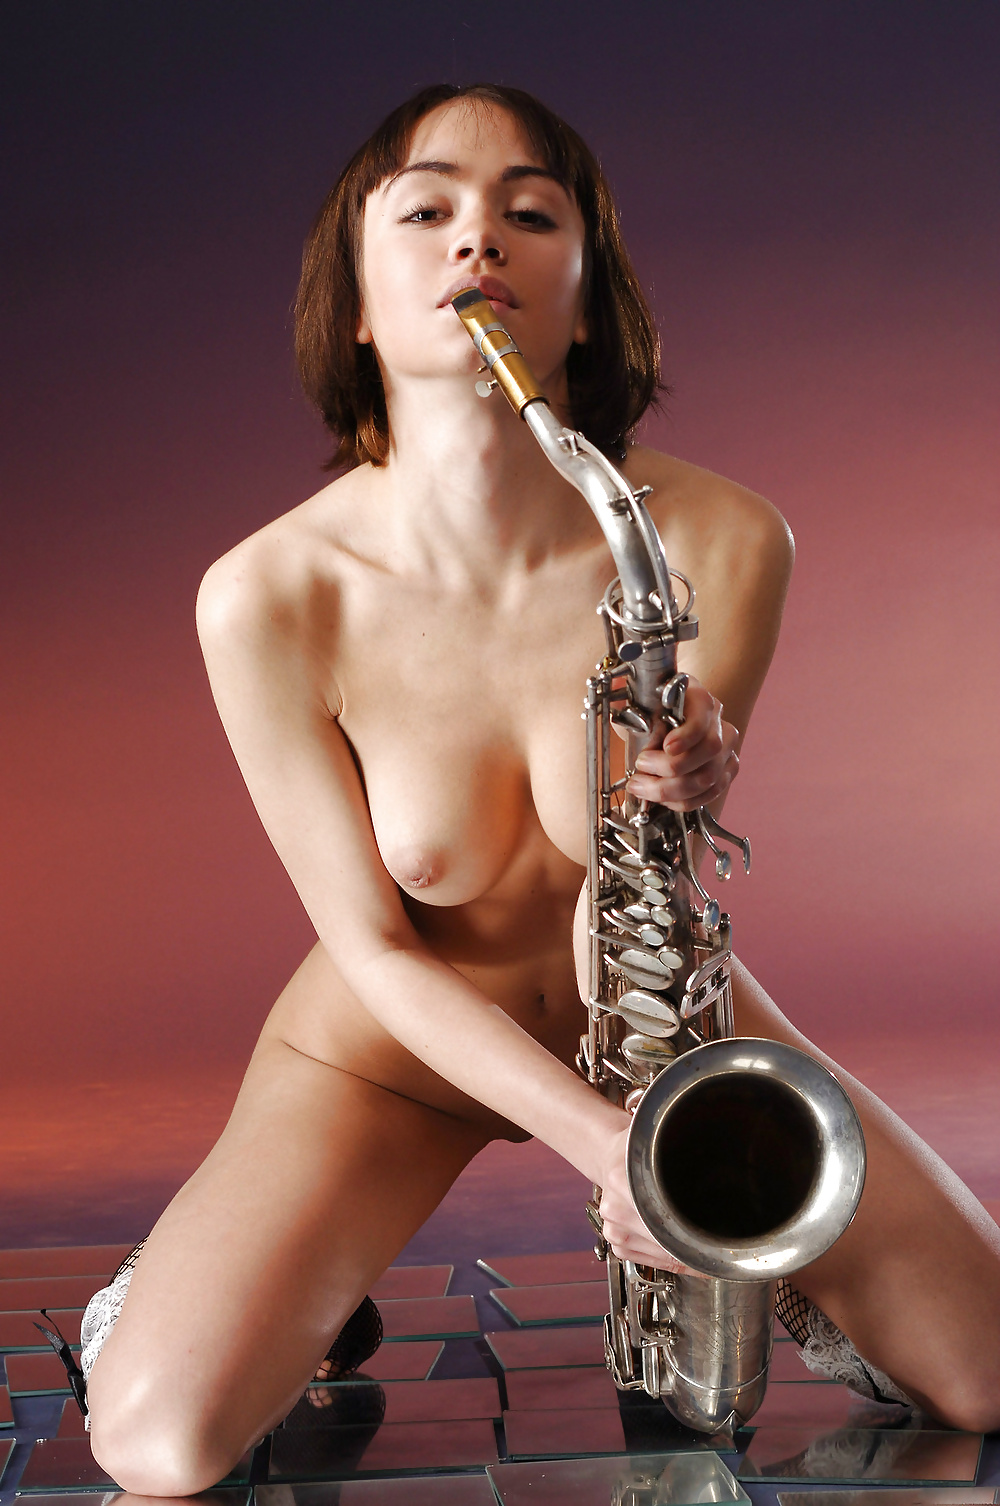 Daddy the saxy garll nude sax imags